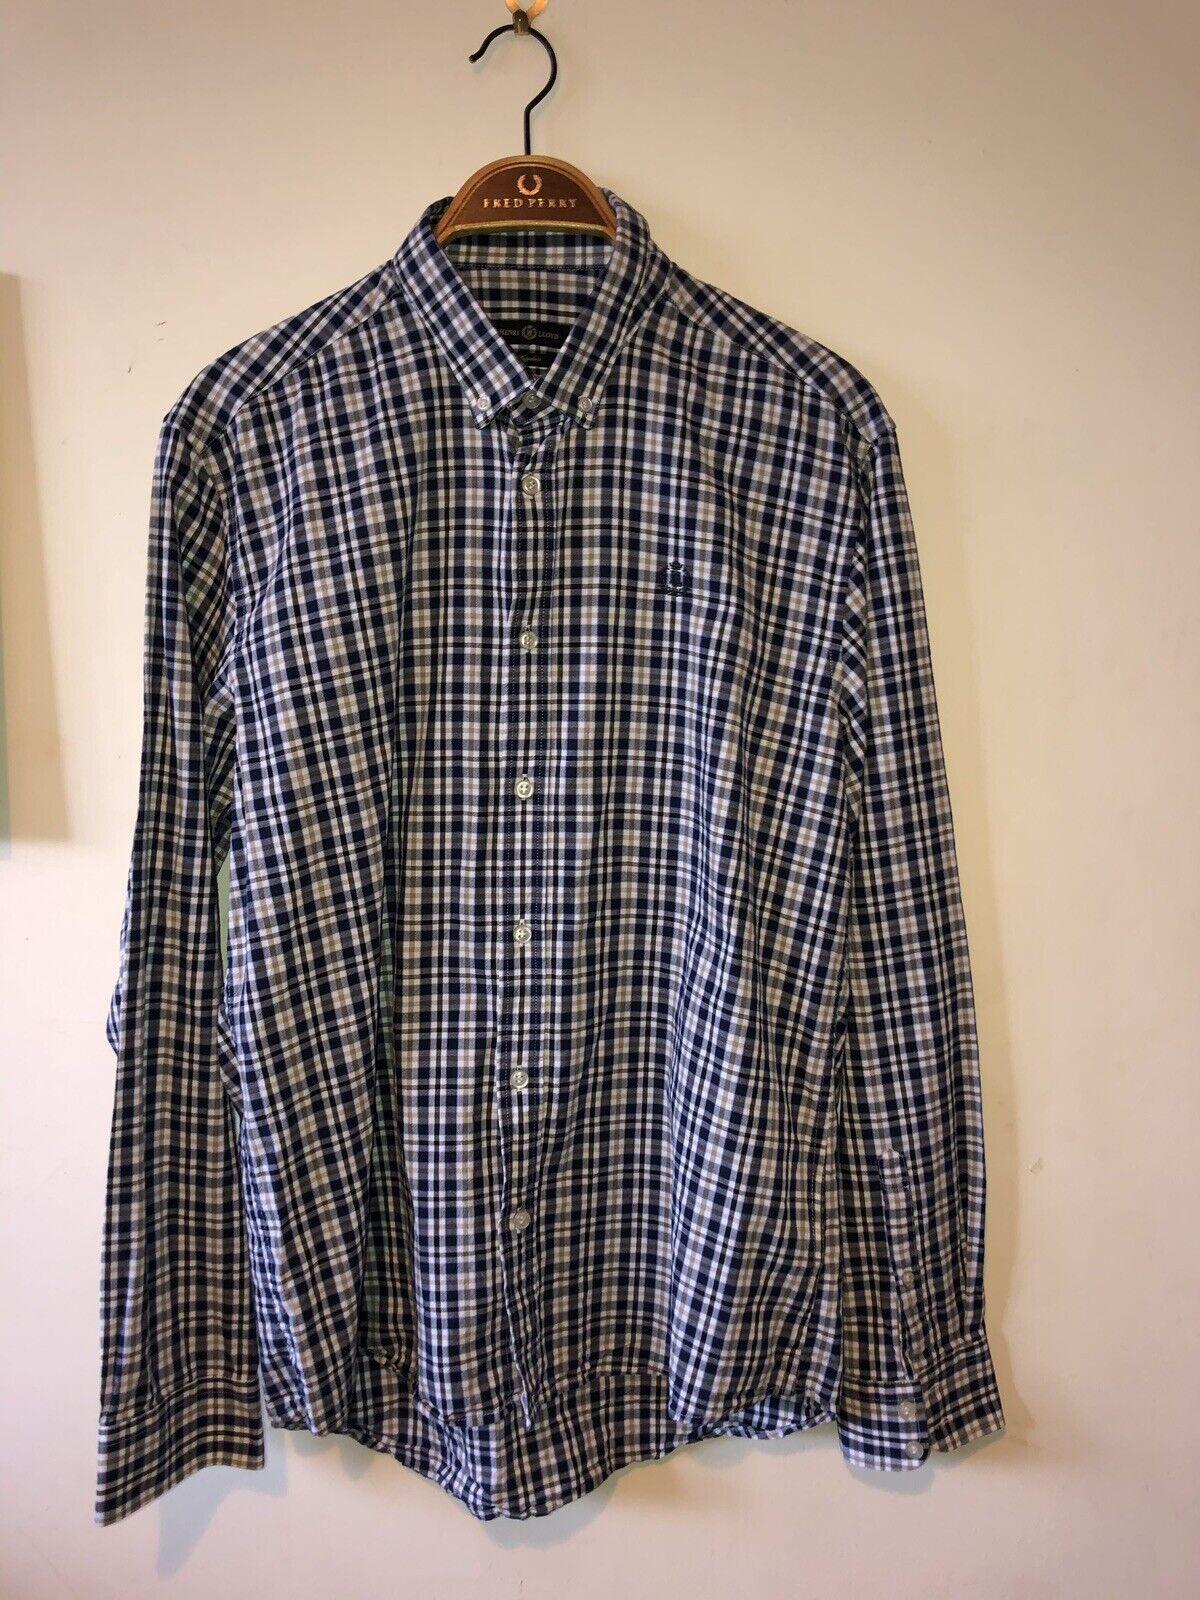 Mens Large Henri Lloyd Shirt Regular Fit Casuals Shirt